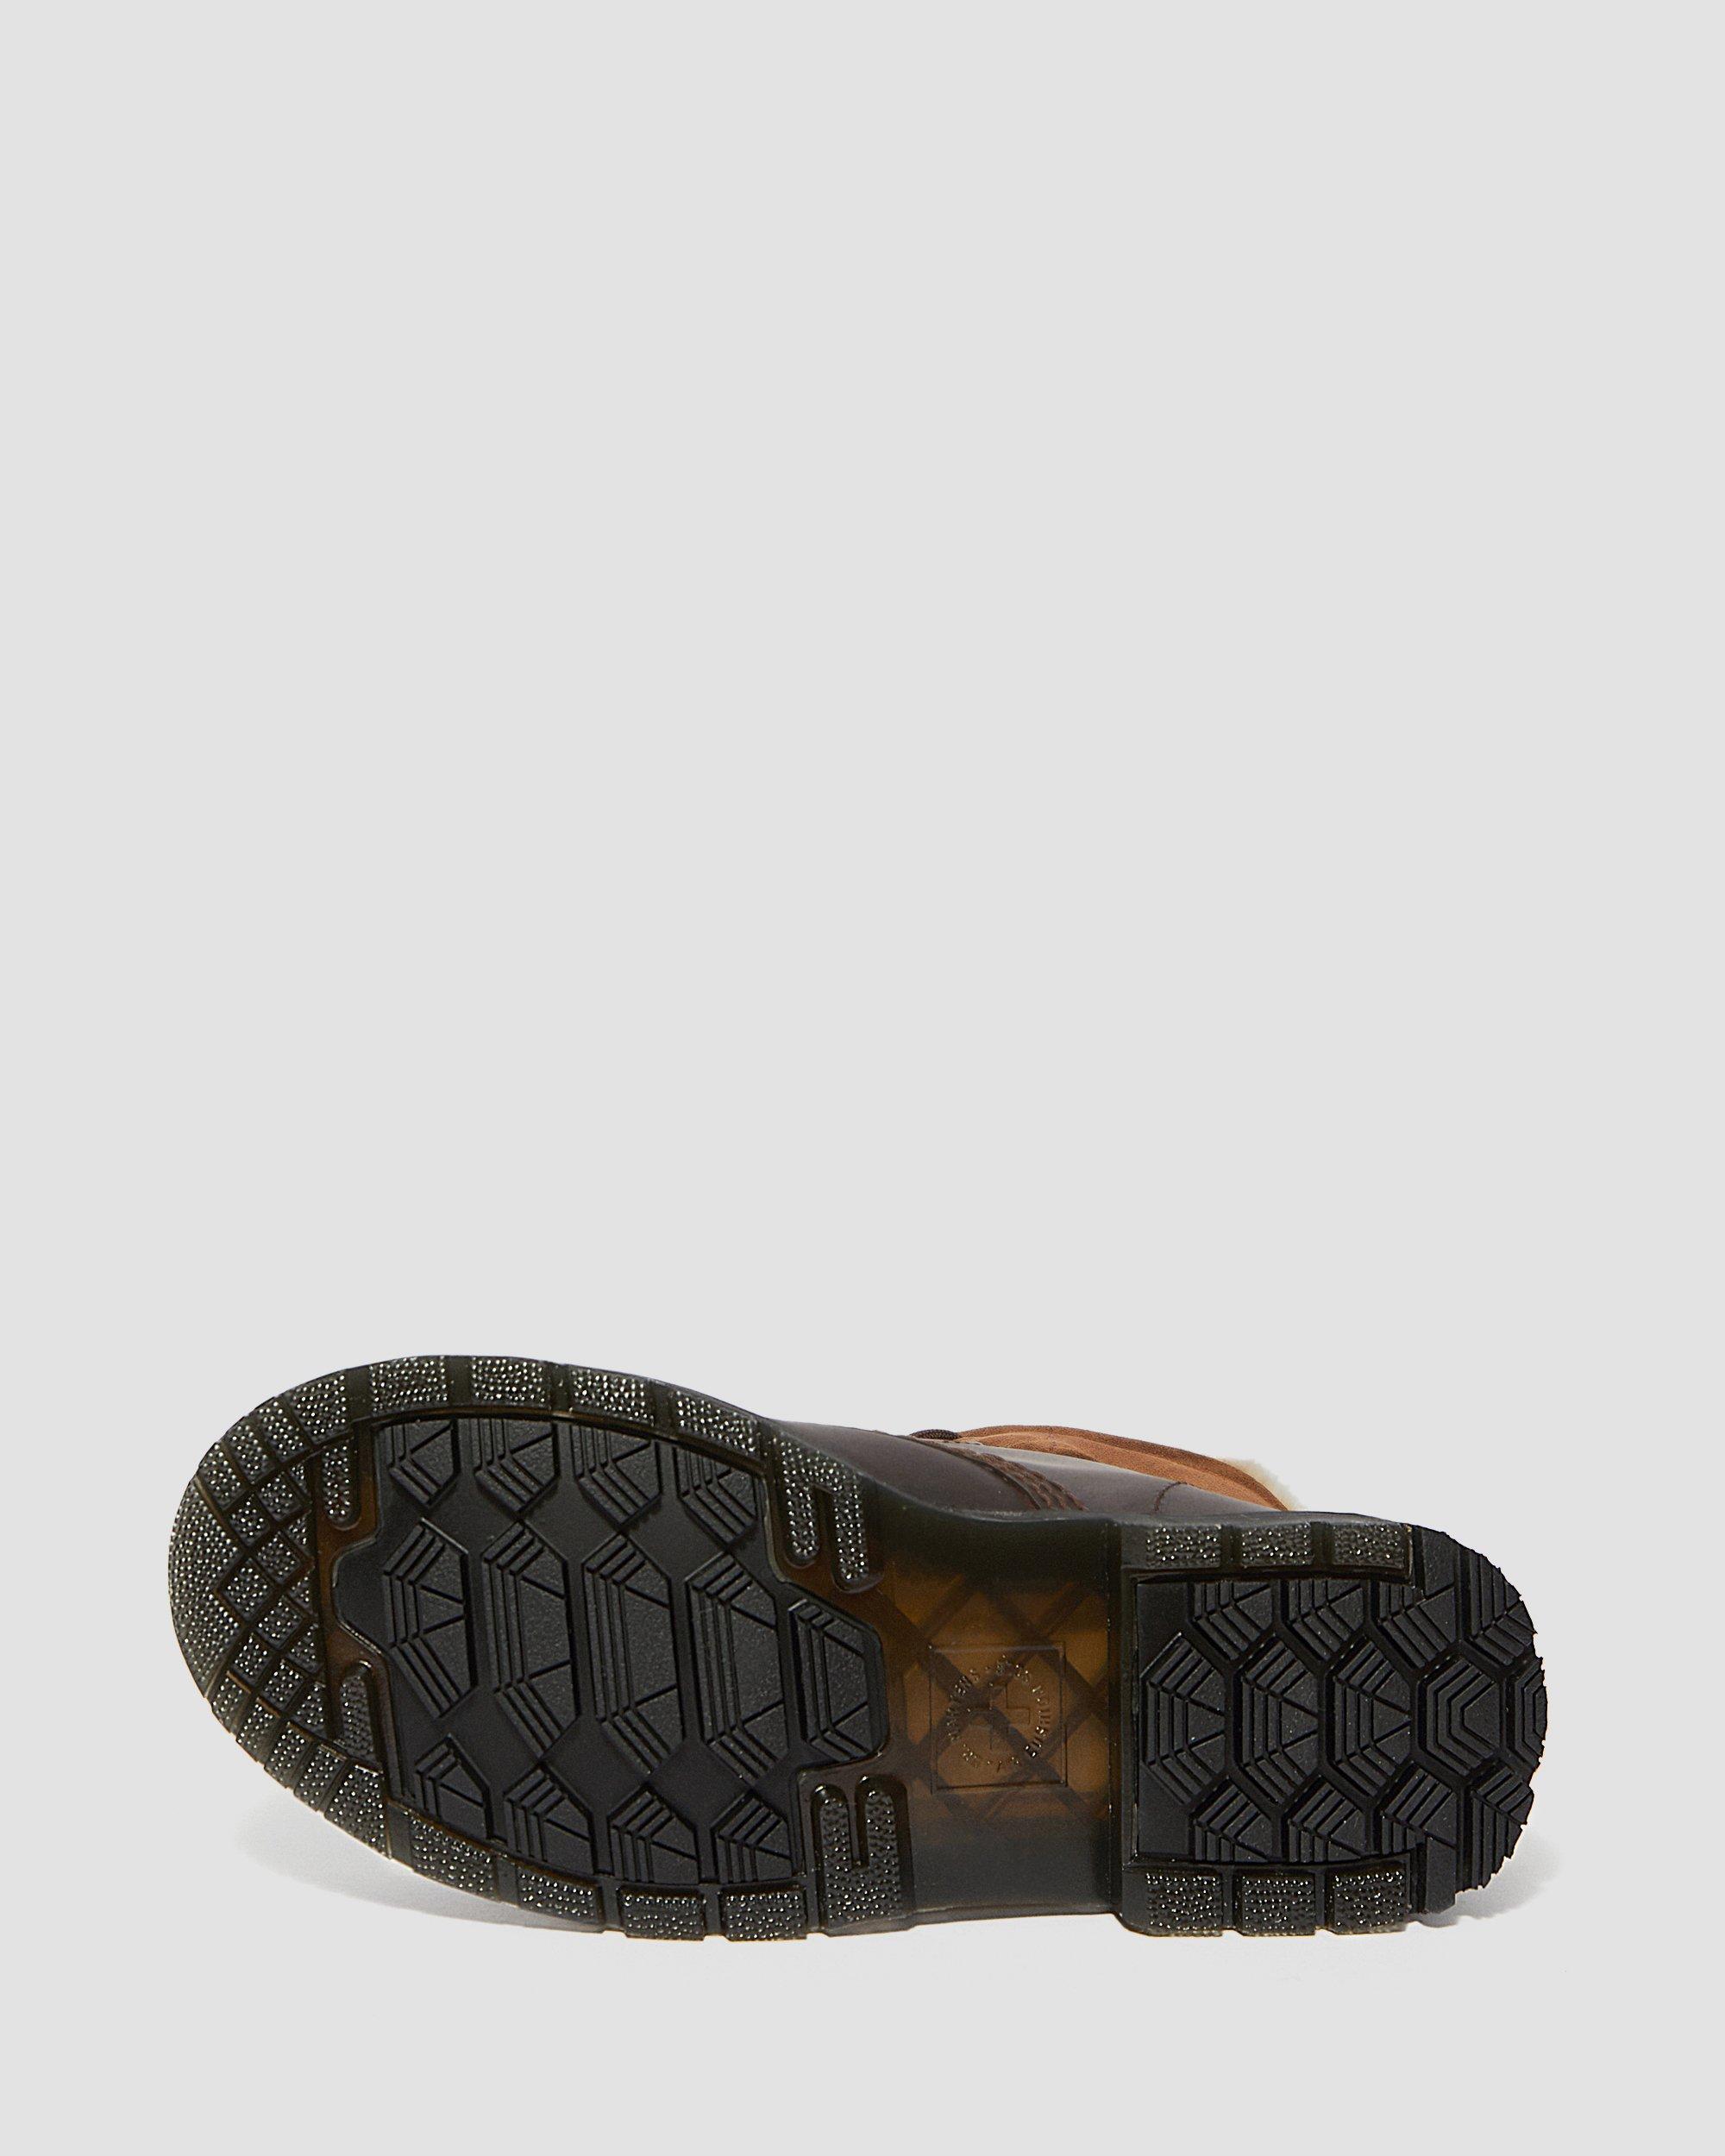 Dr. Martens brown wintergrip 1460 boots